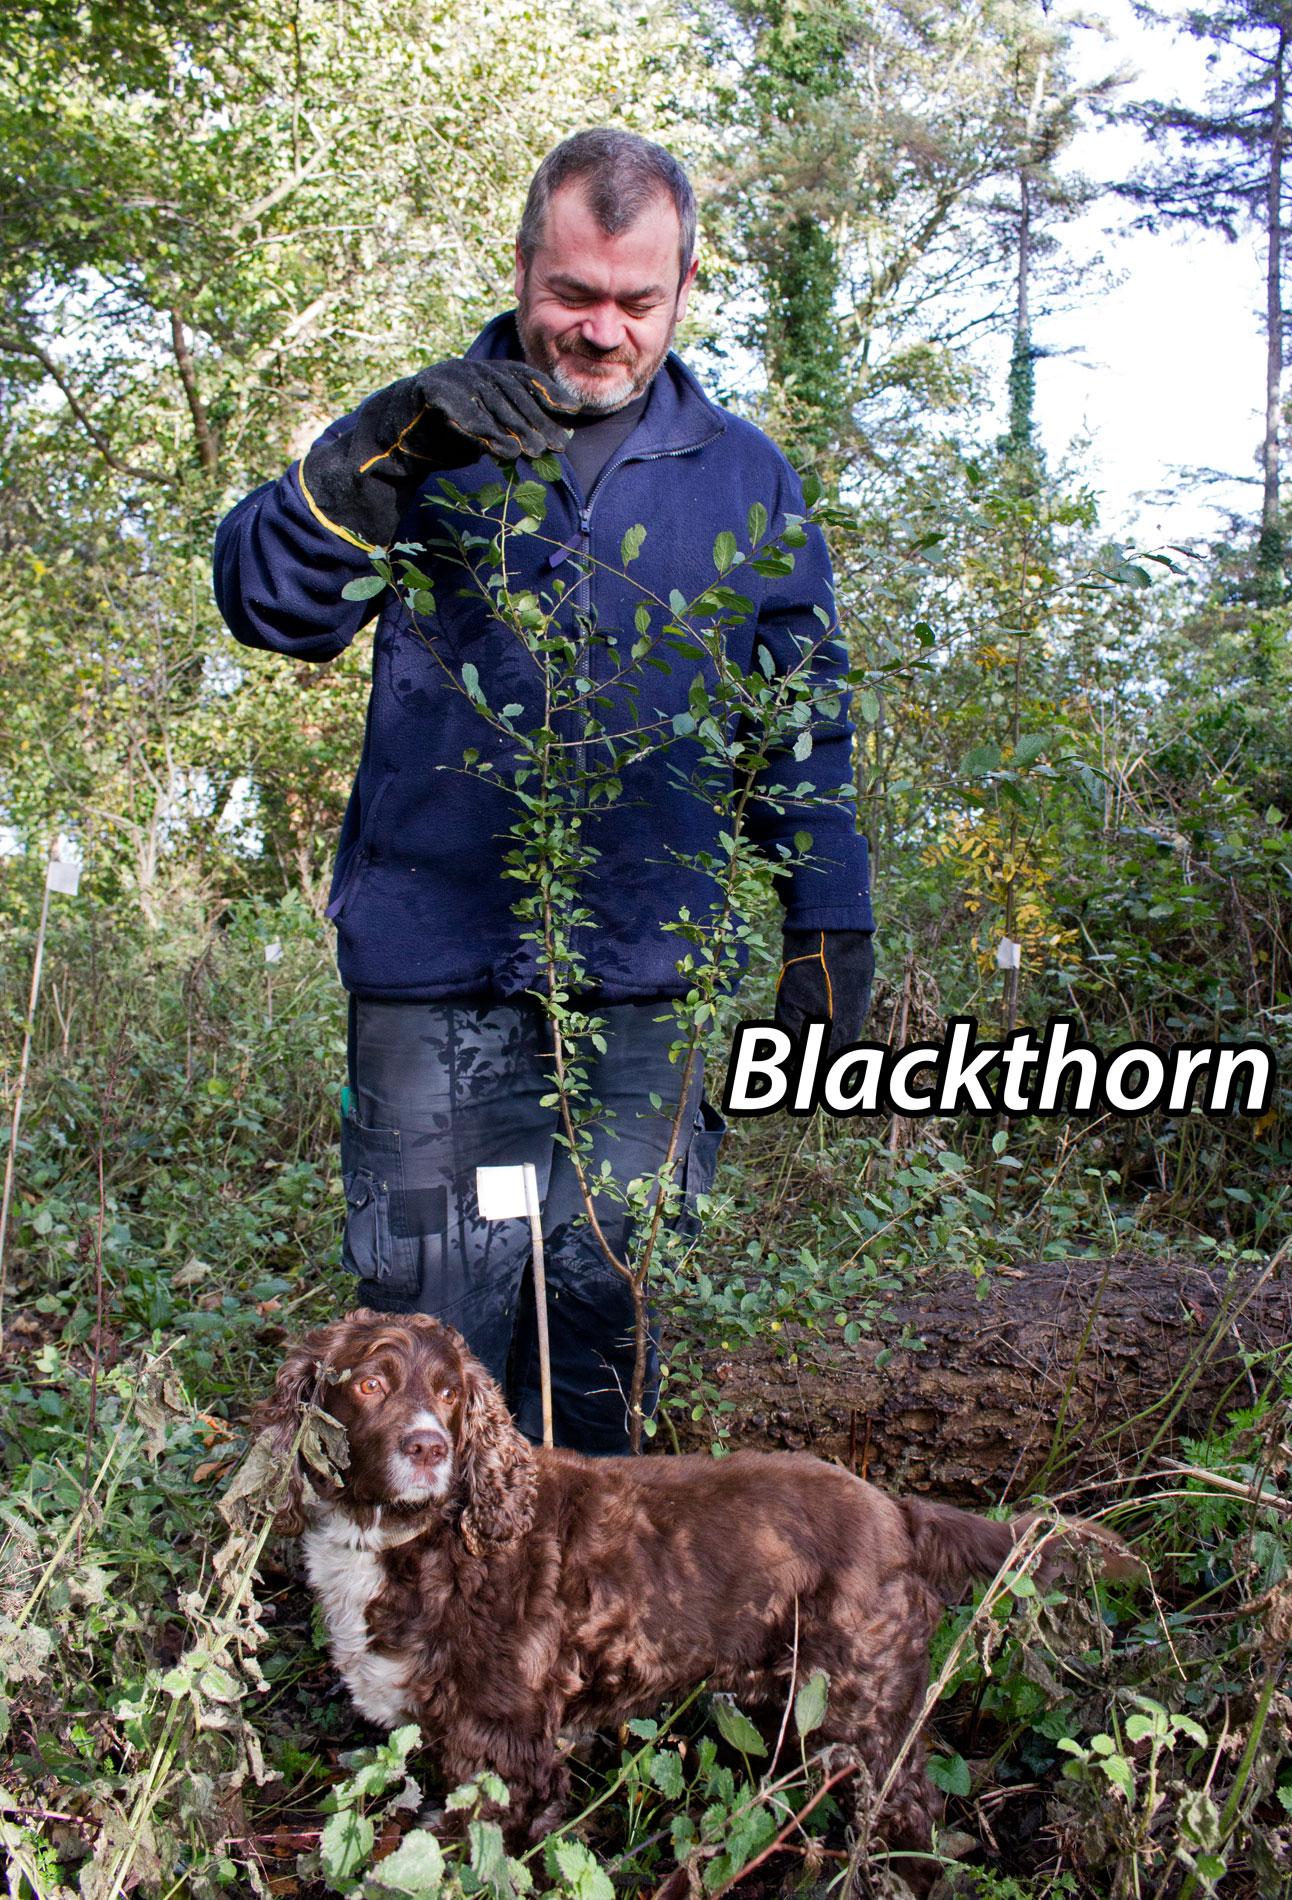 Blackthorn-1txt